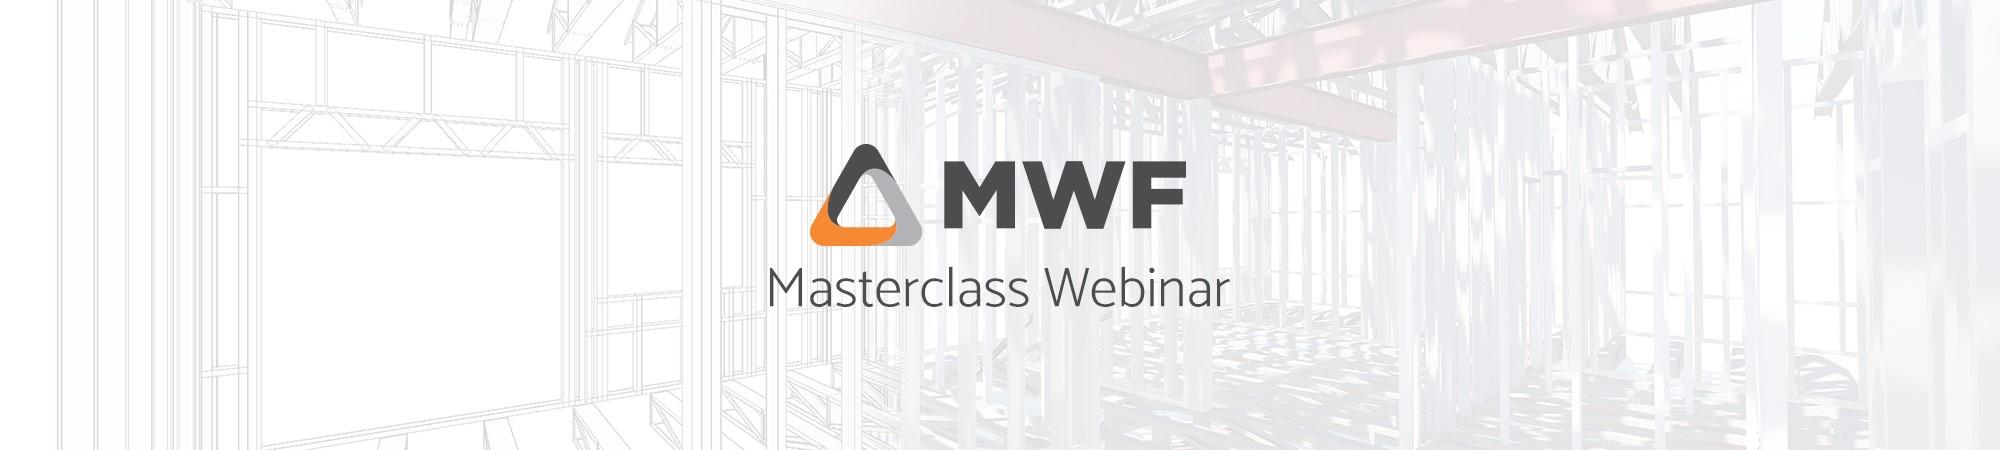 MWF Masterclass image.jpg